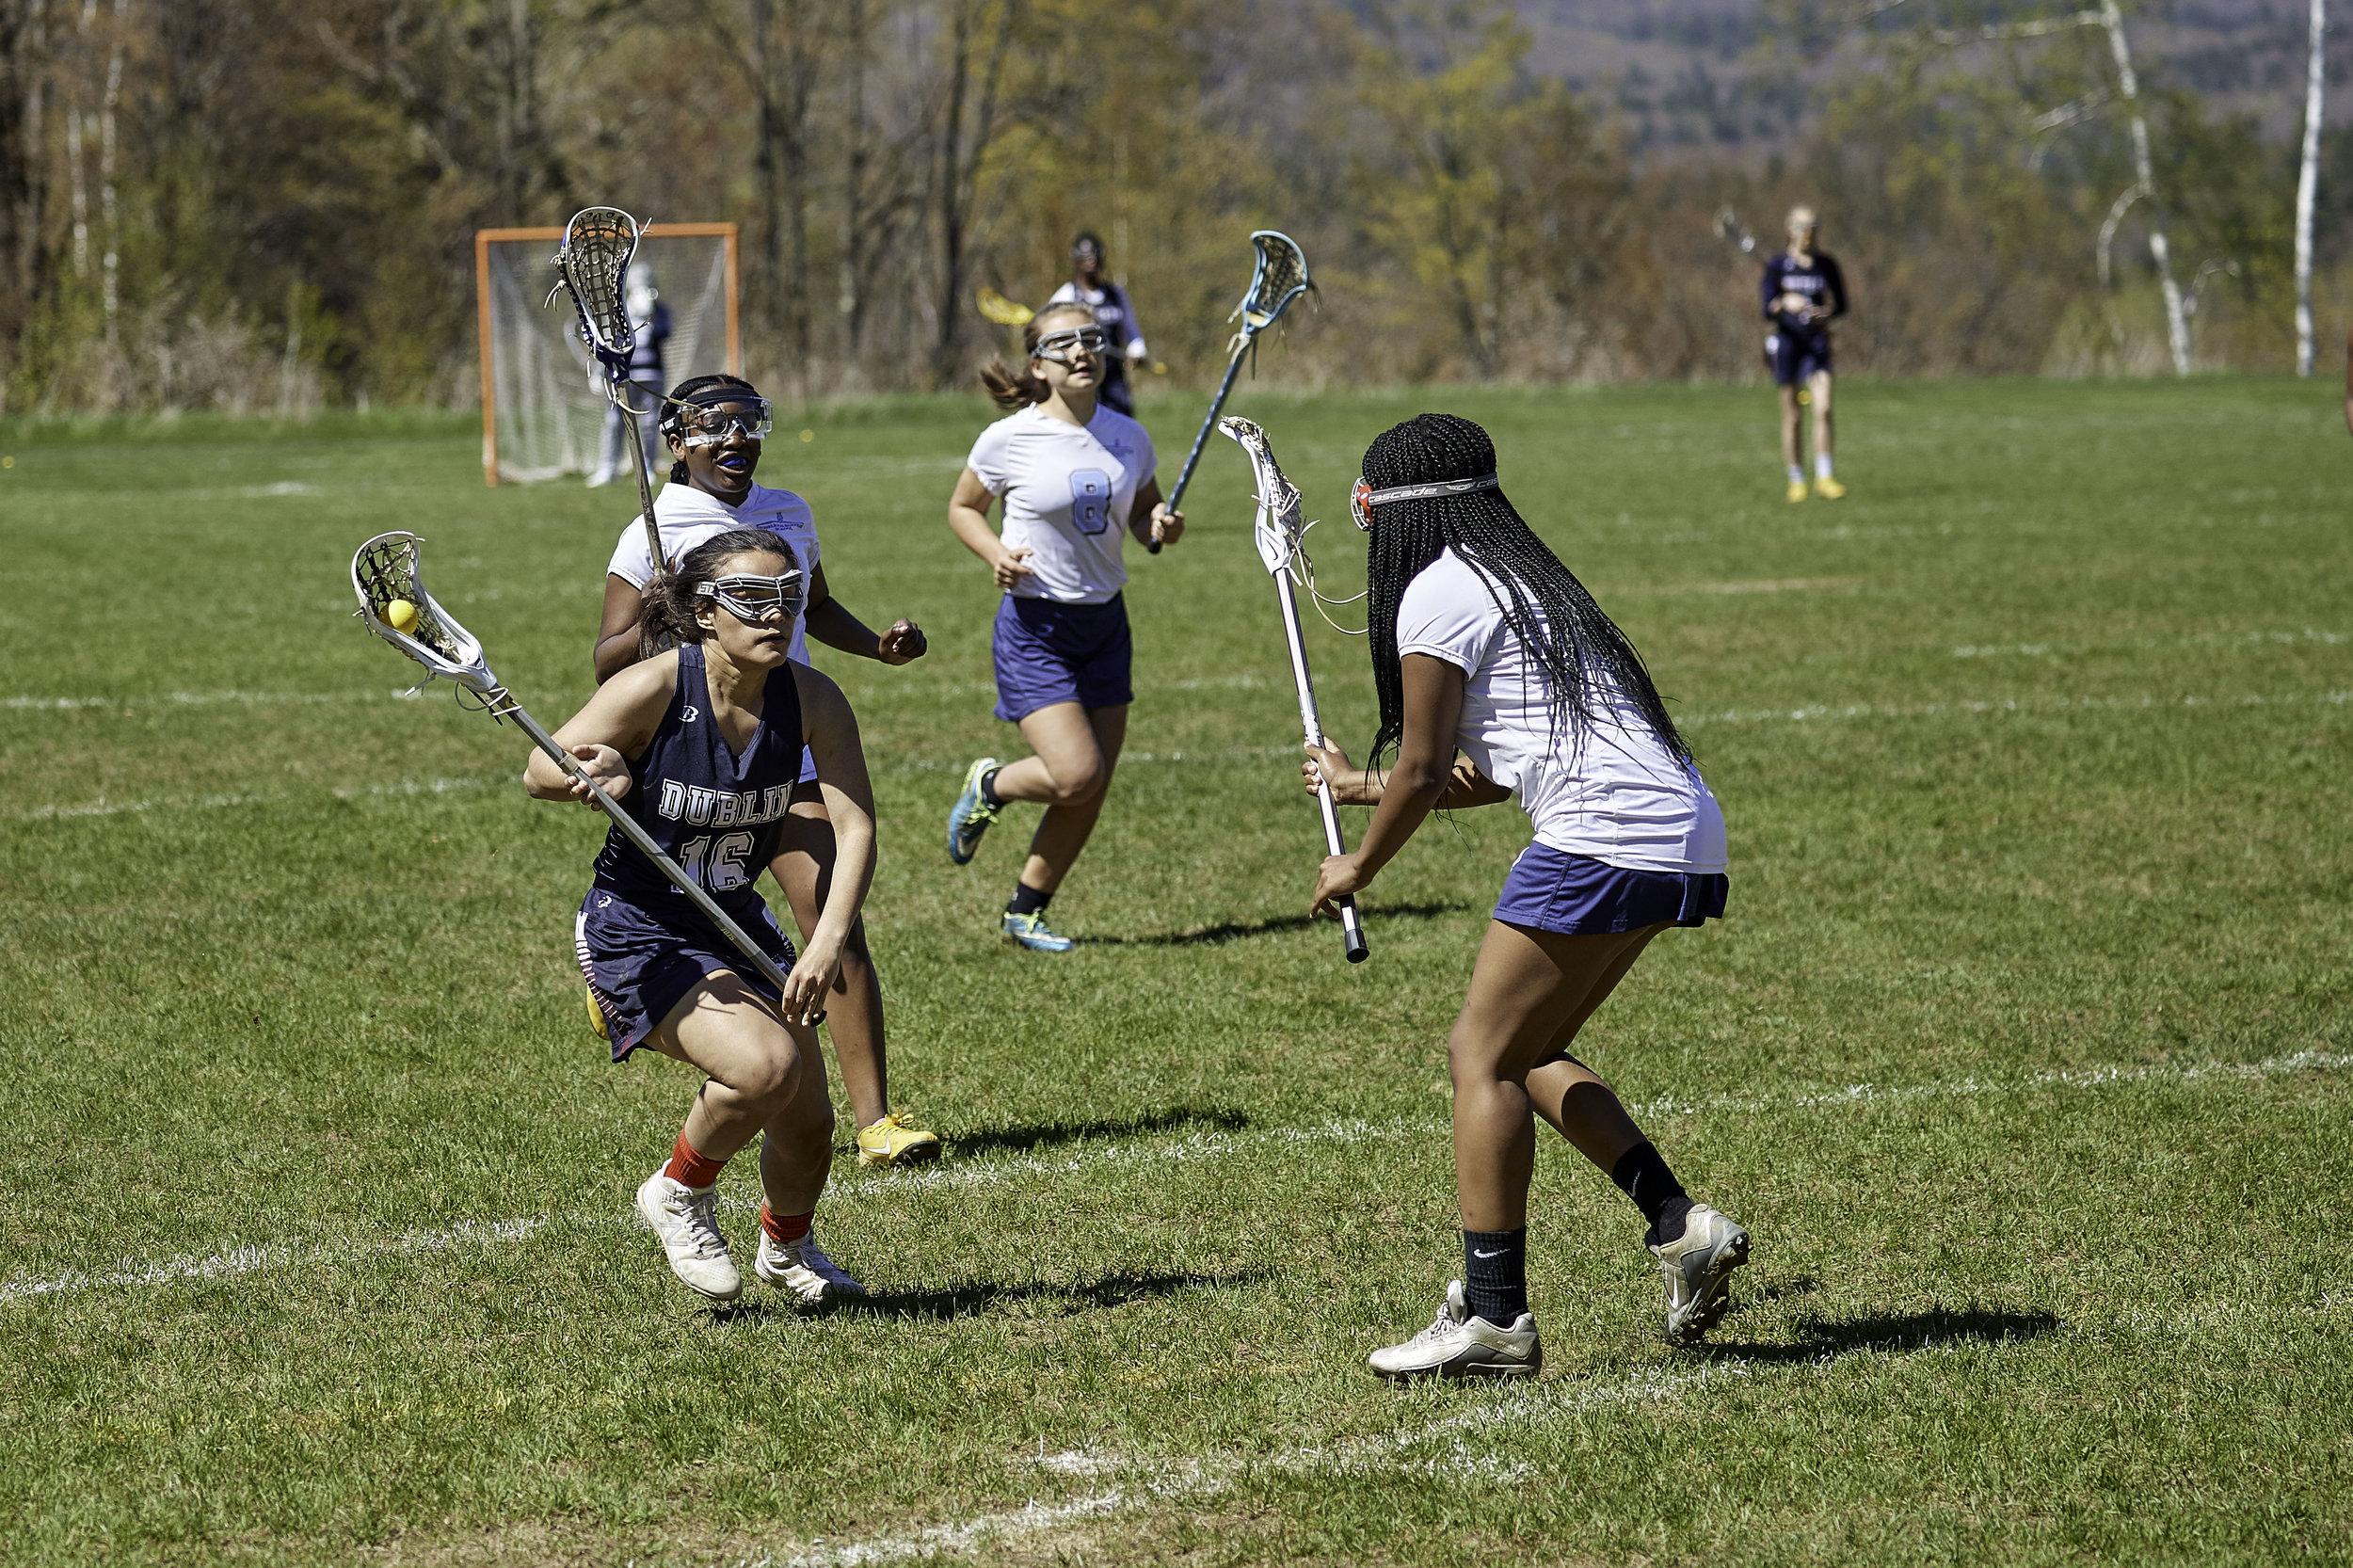 Girls Lacrosse vs. Stoneleigh Burnham School - May 11, 2019 - May 10, 2019193314.jpg